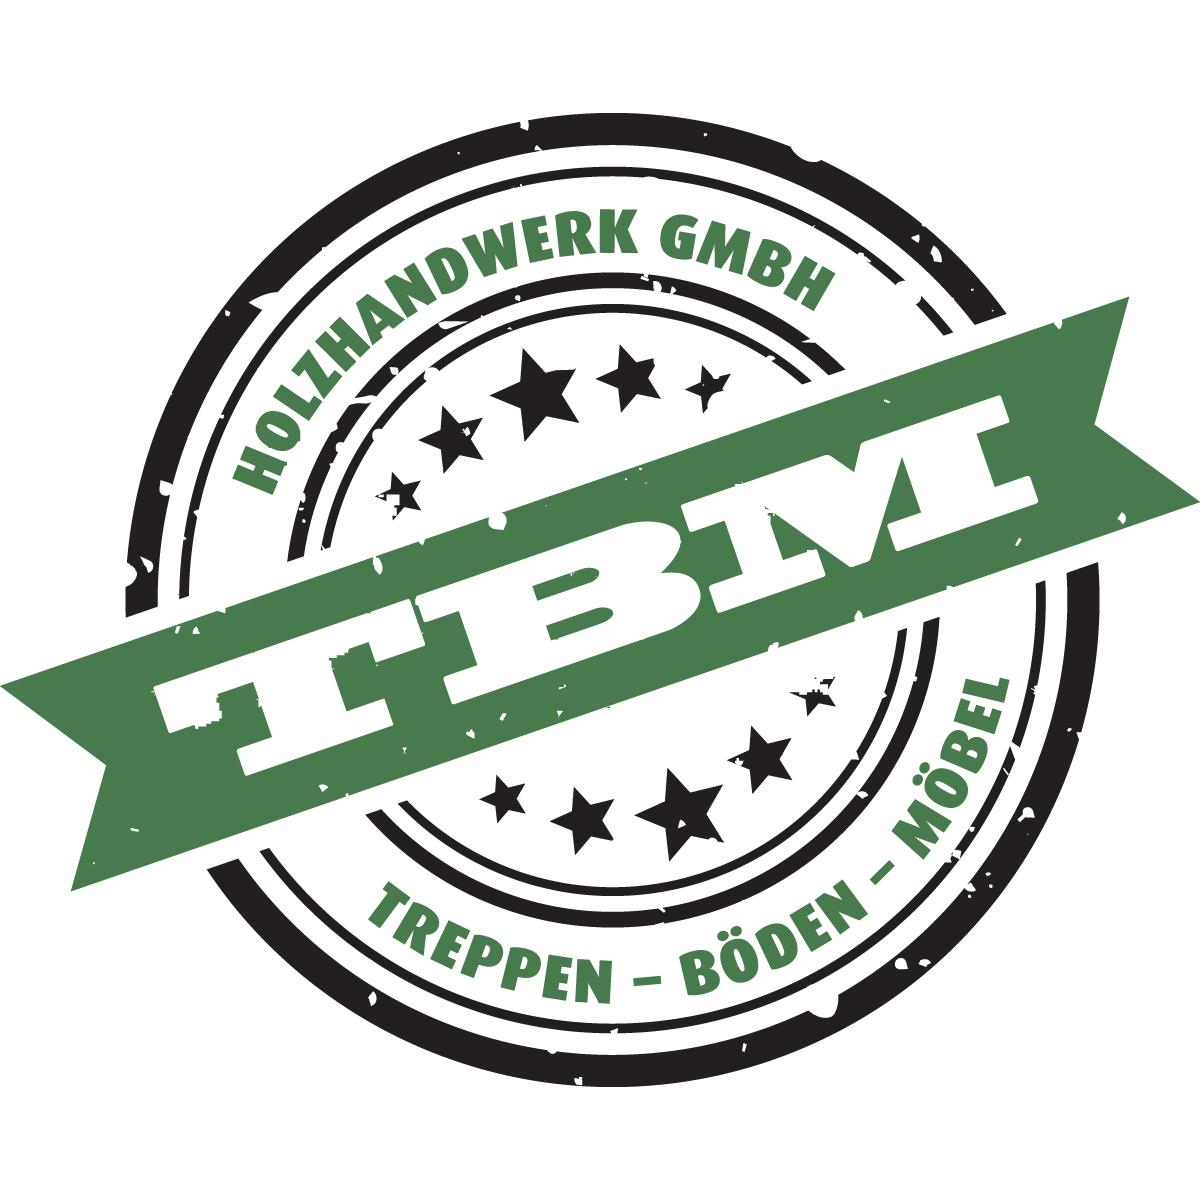 TBM HOLZHANDWERK GMBH